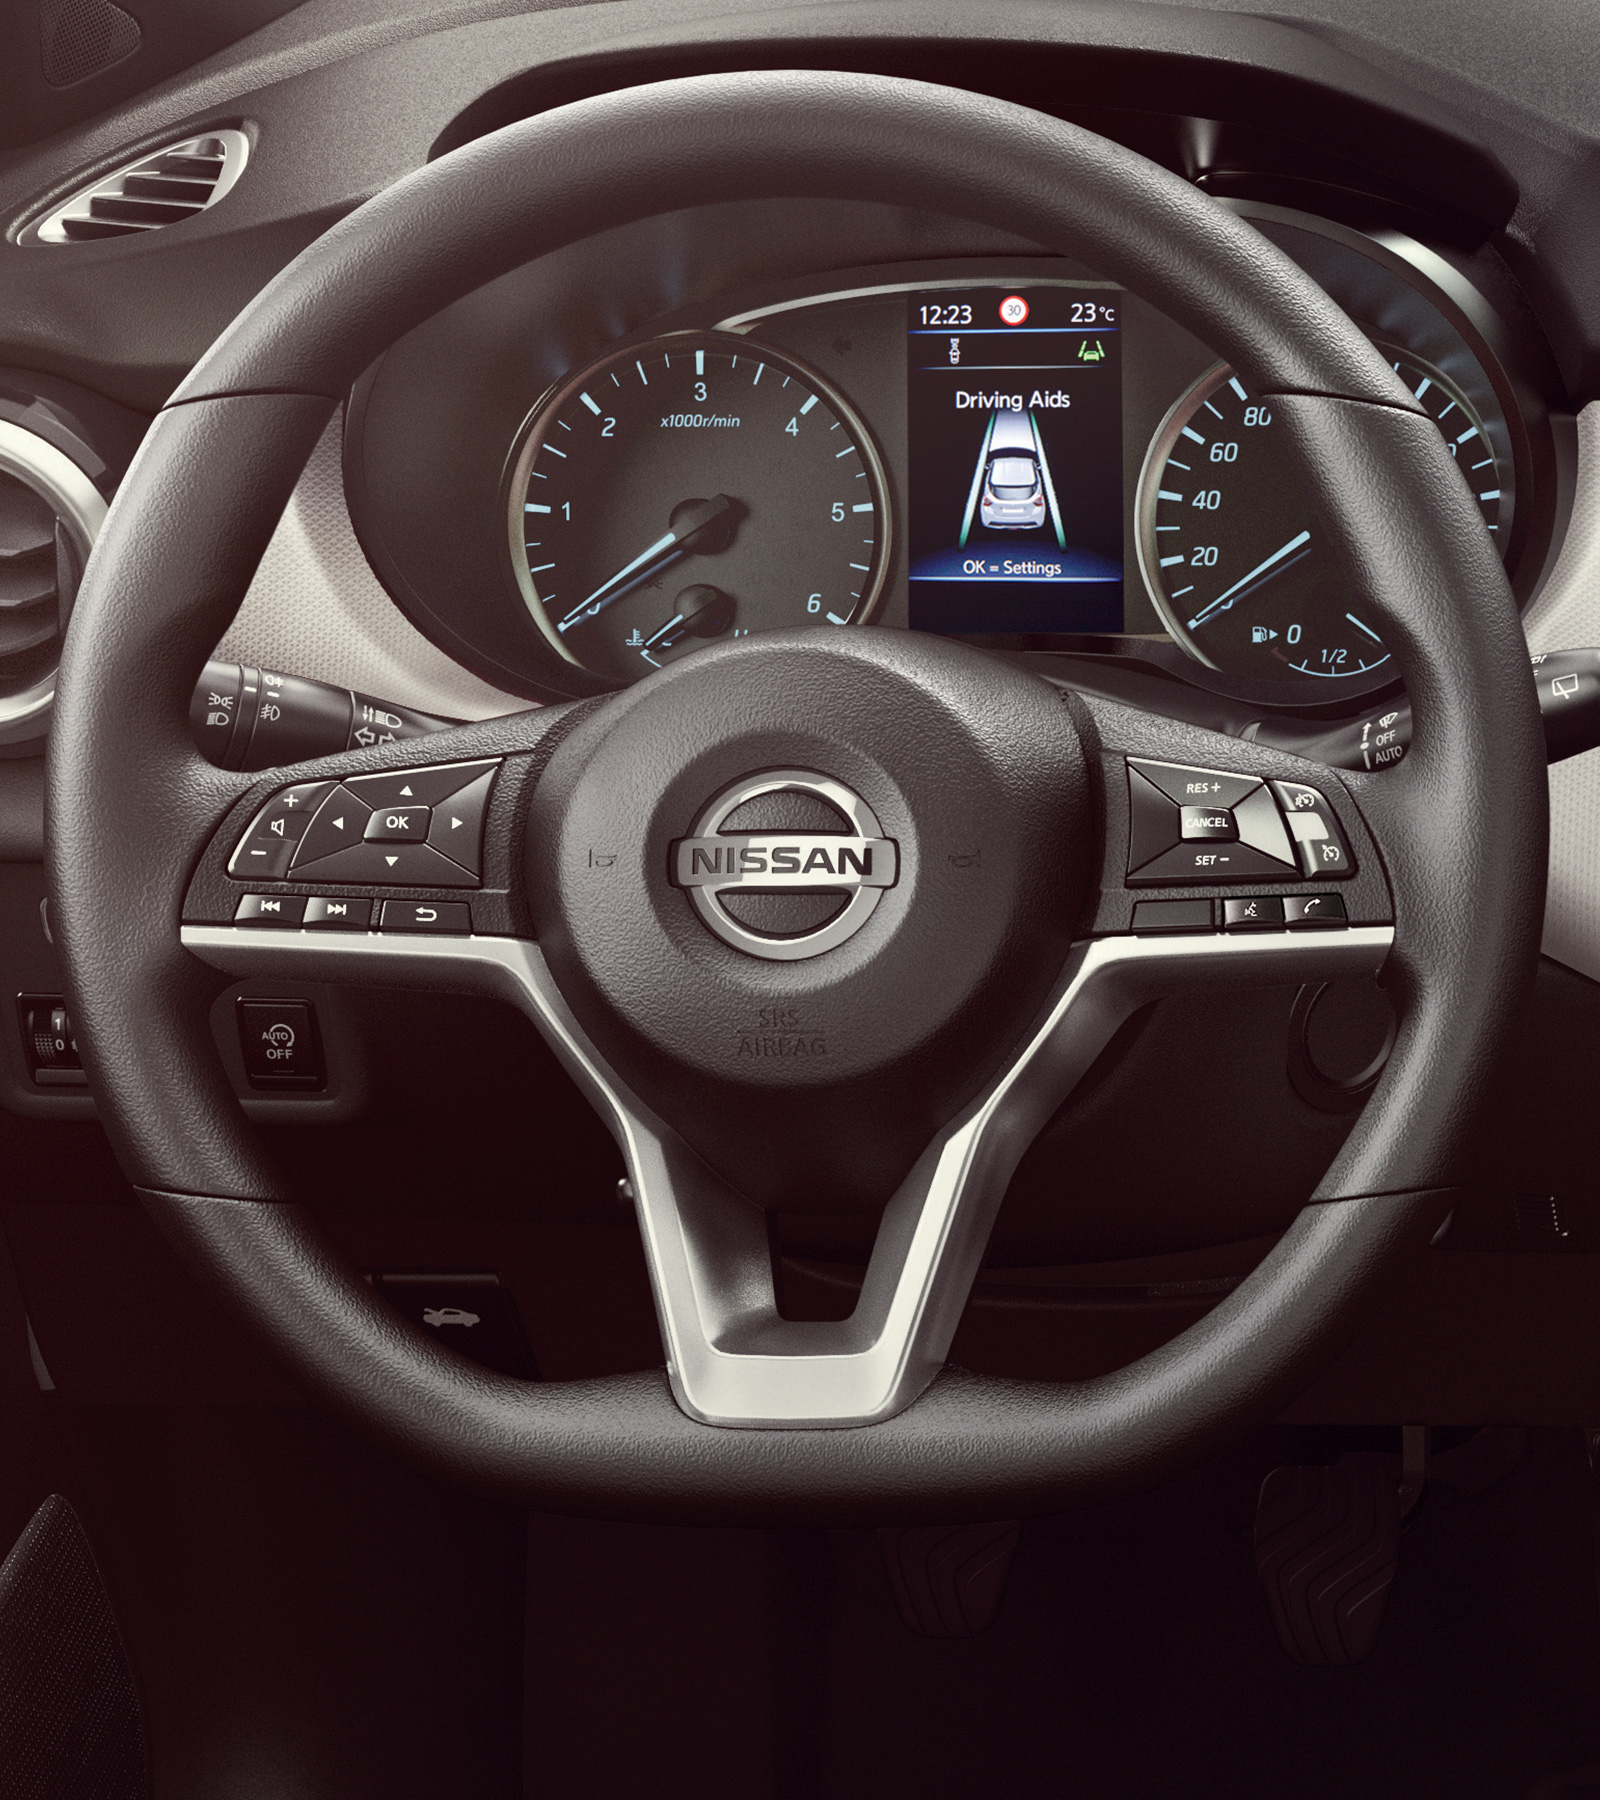 Nissan Micra D shaped steering wheel